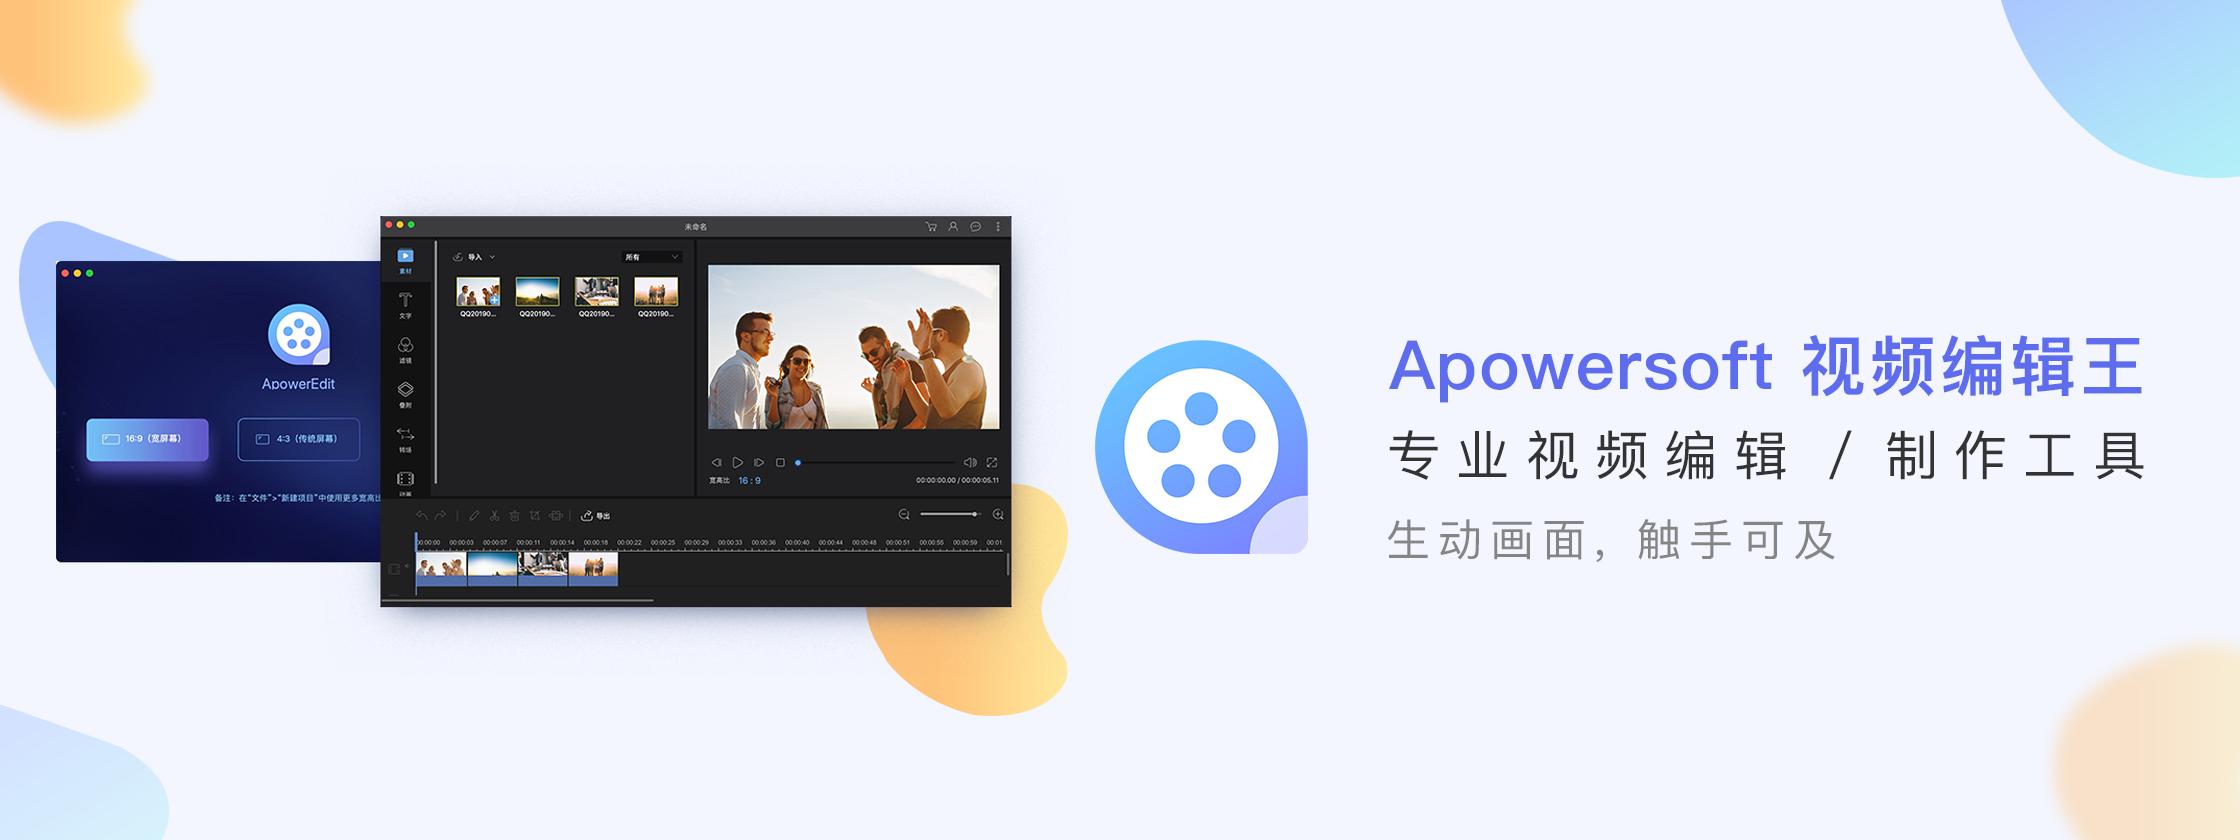 Apowersoft 视频编辑王: 专业的视频编辑 / 制作工具